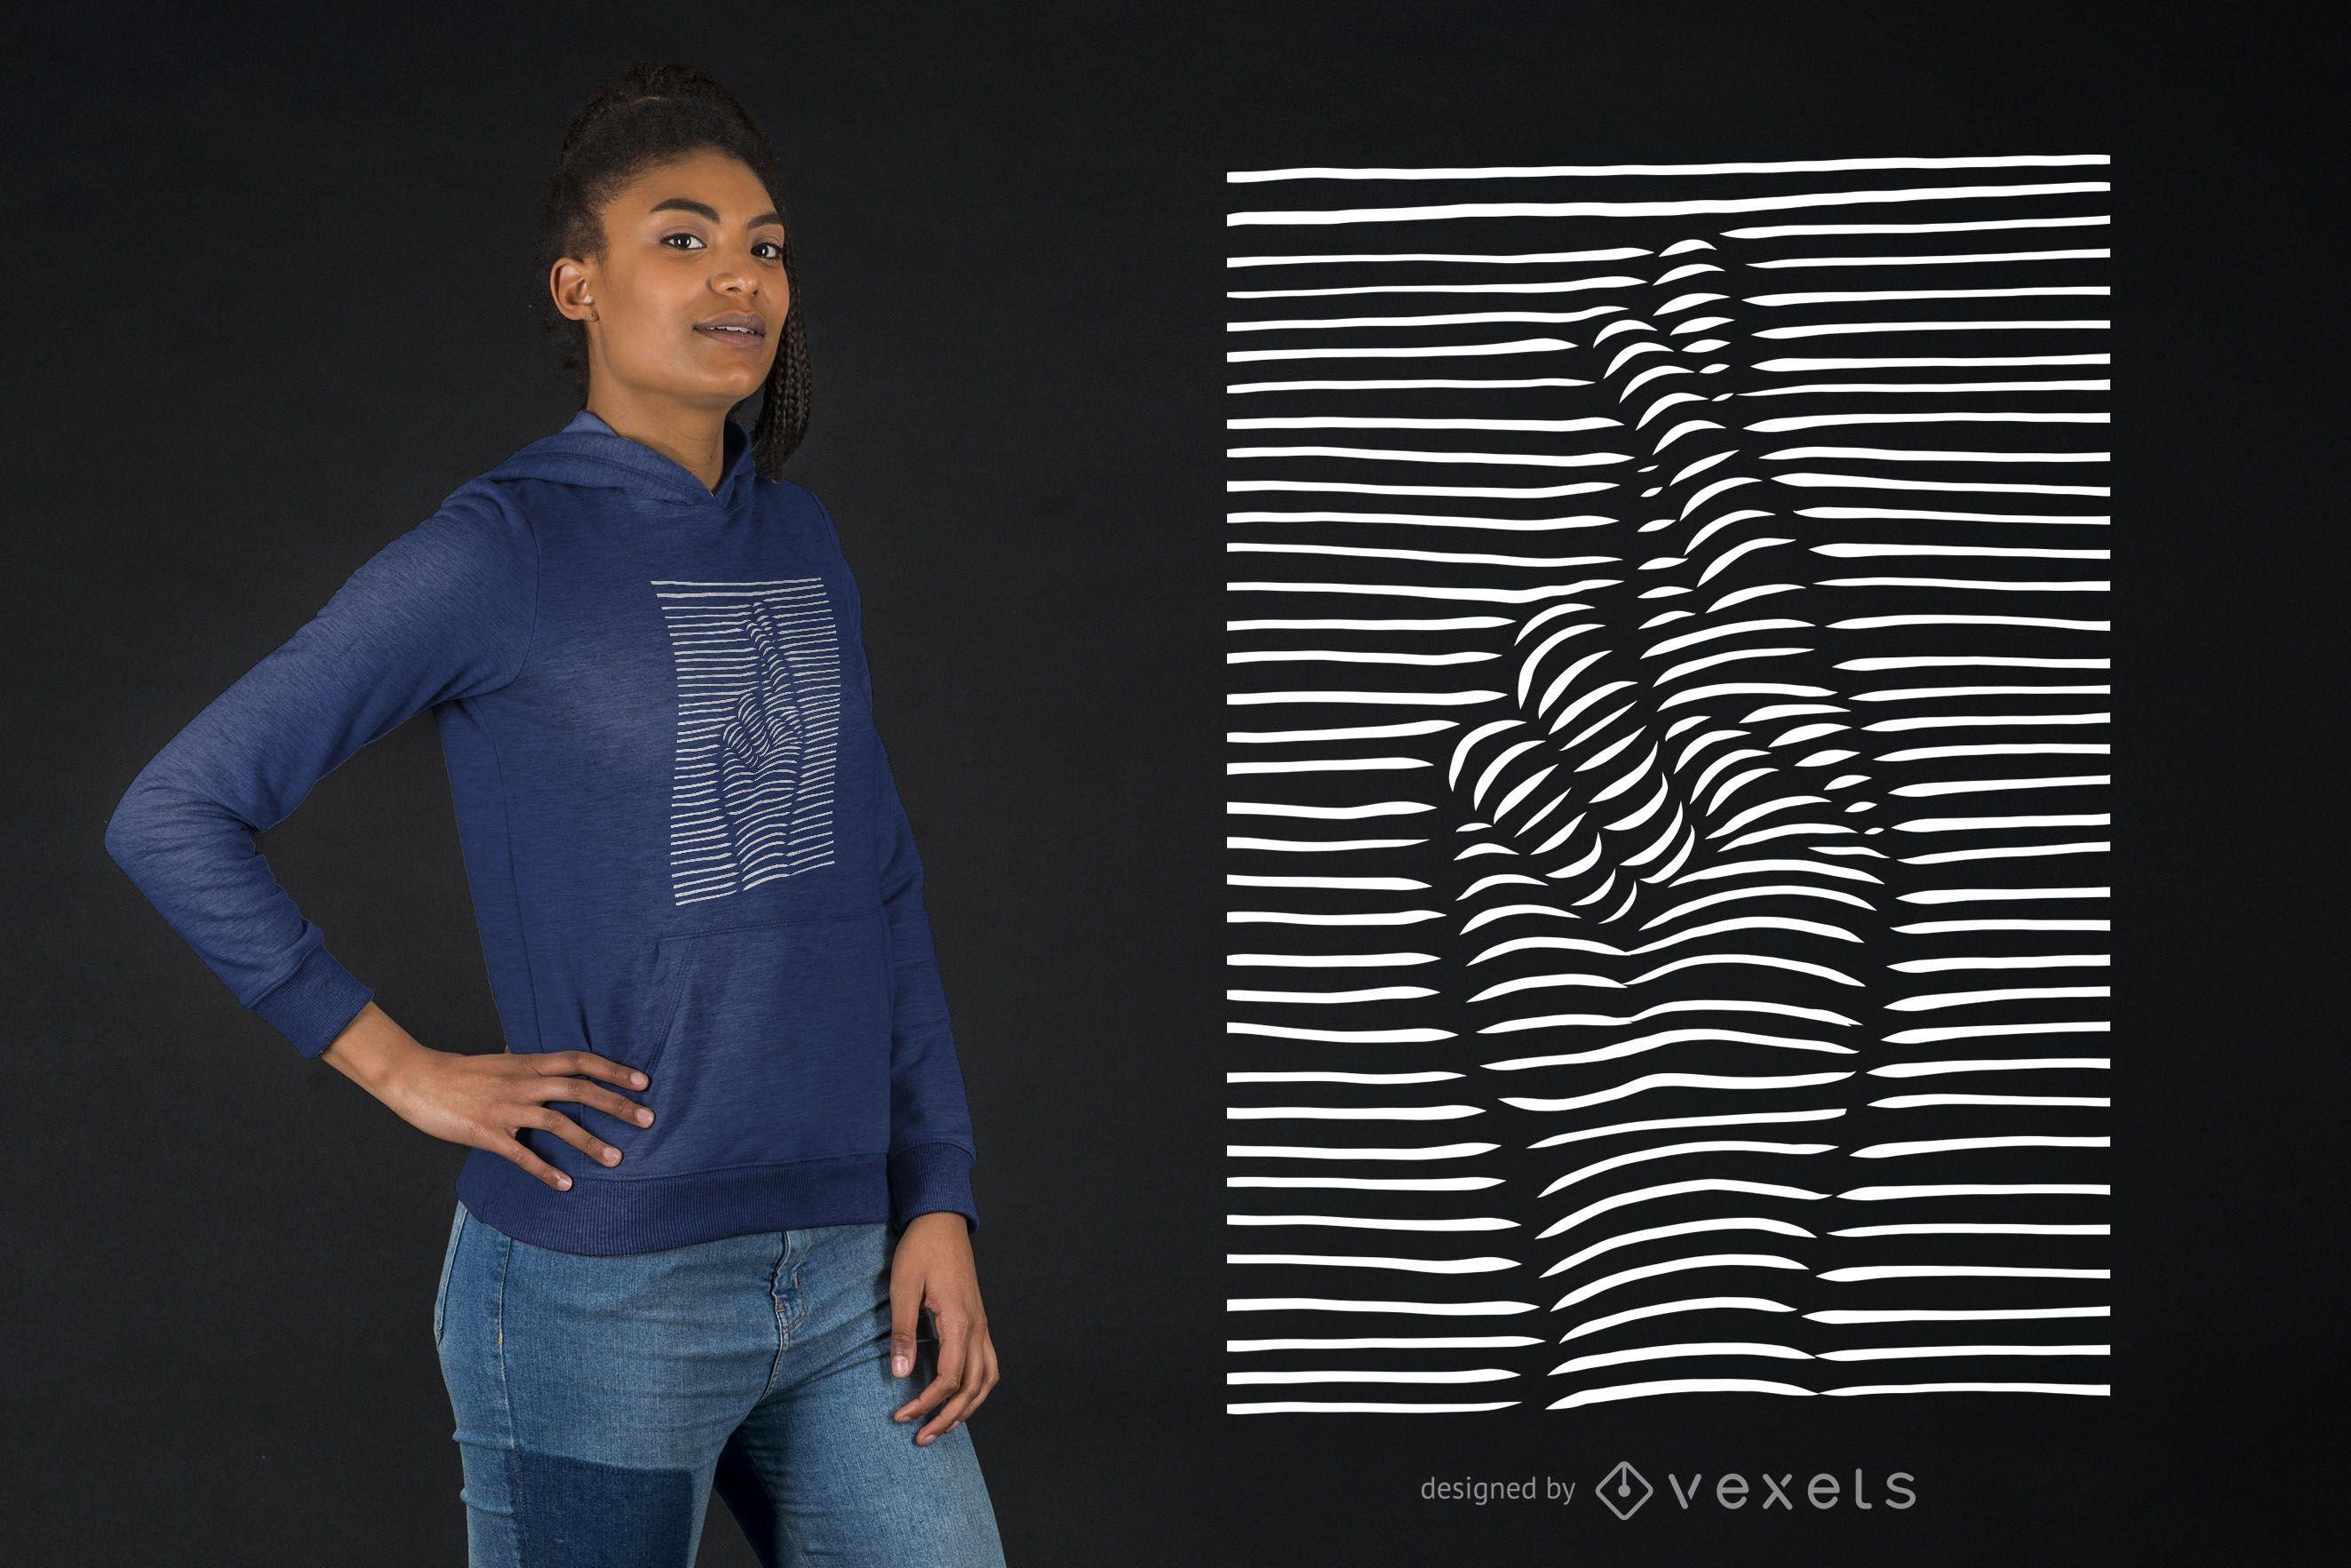 3D Effect Crossed Fingers T-shirt Design